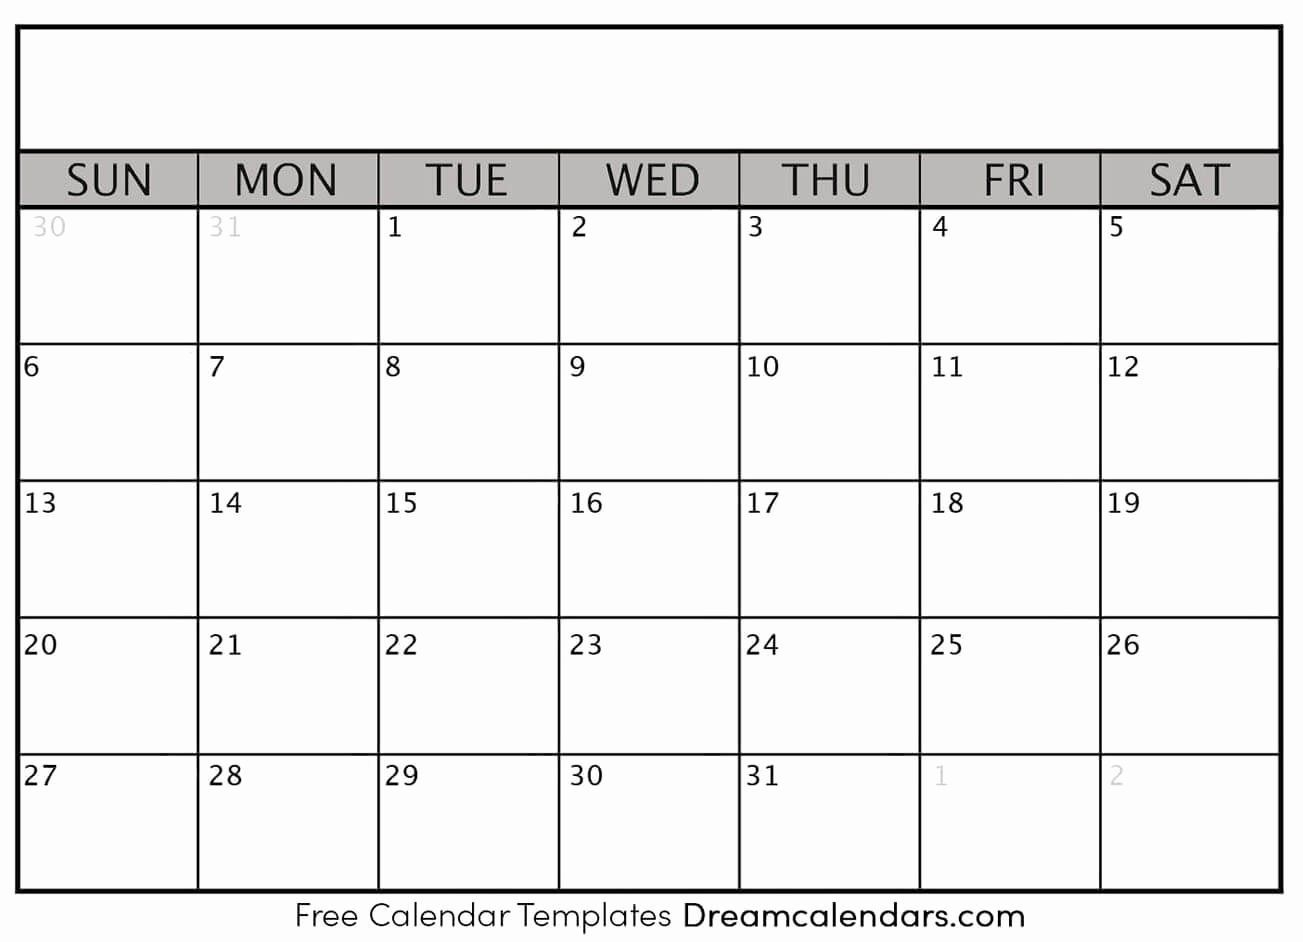 free printable calendar templates in 2020 | printable